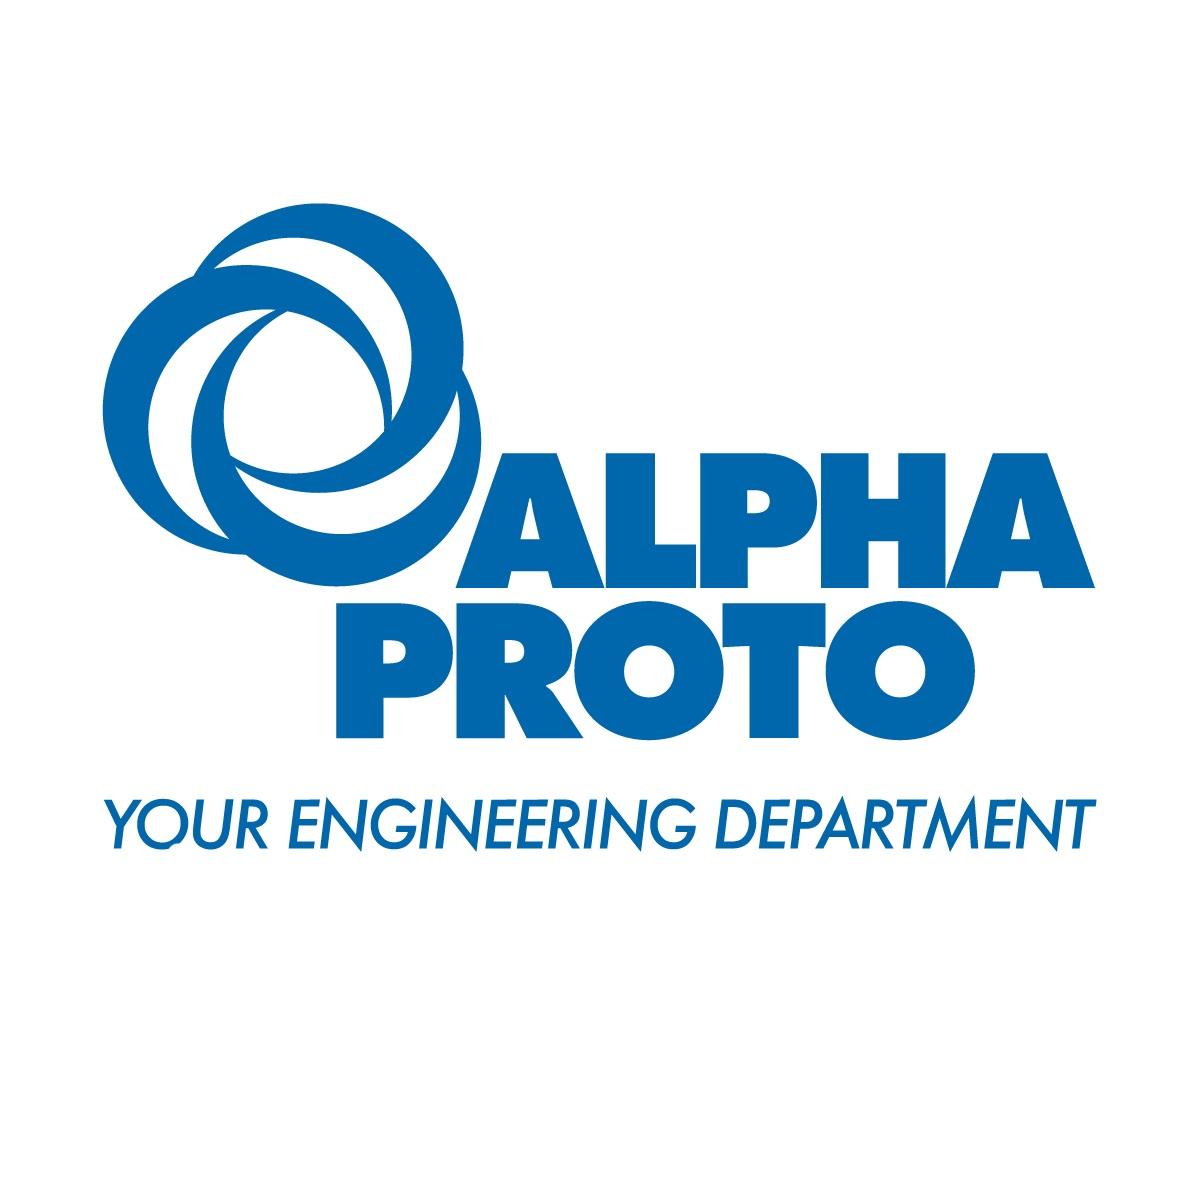 Alpha Proto